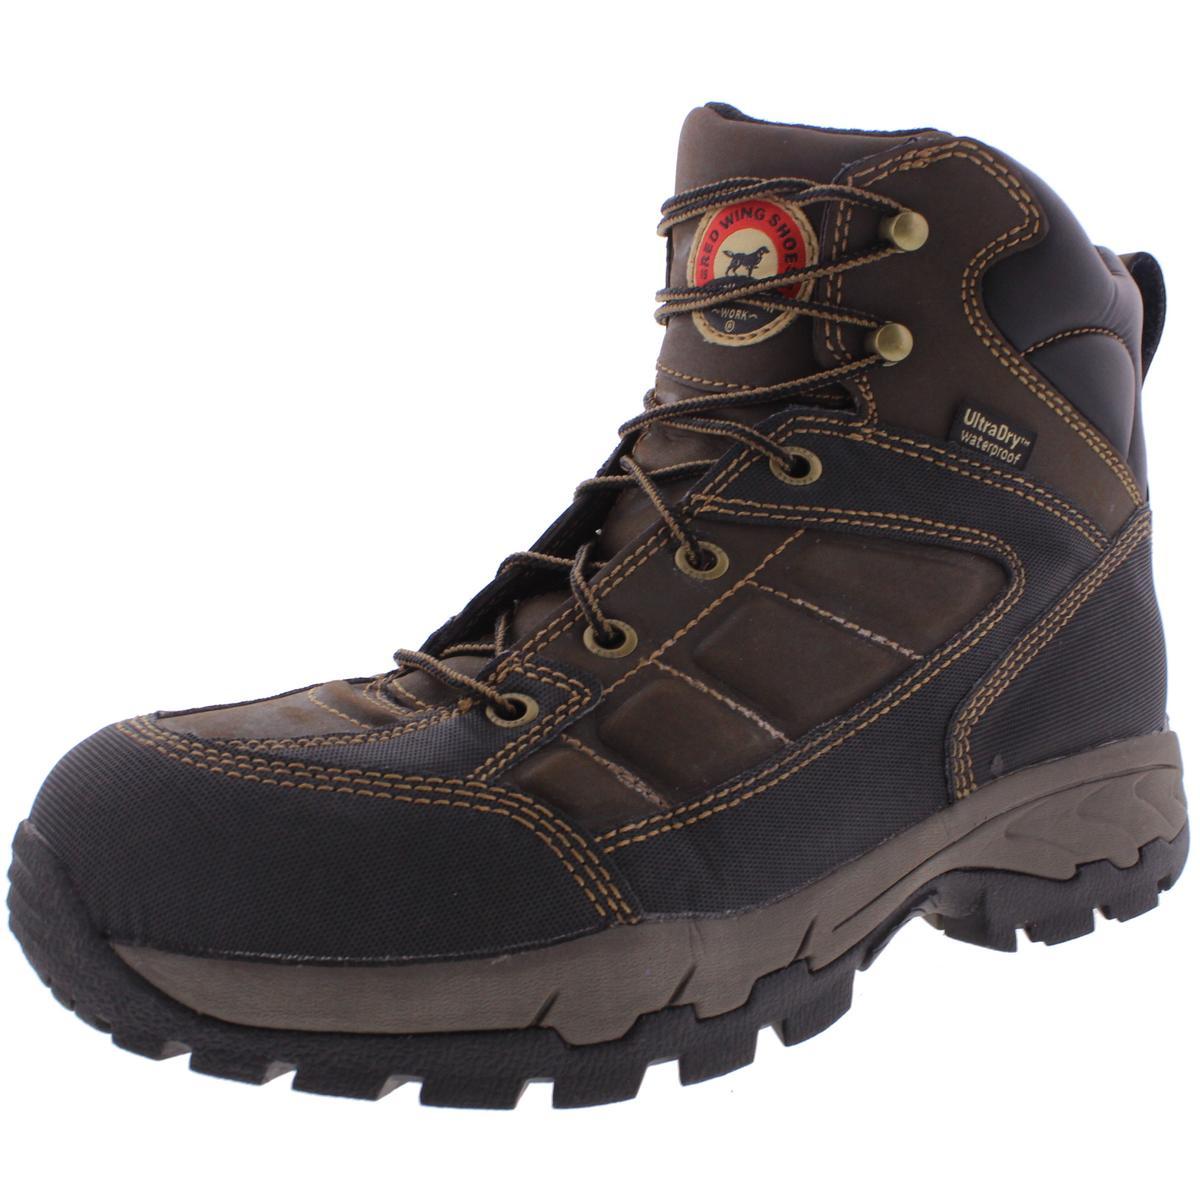 "Irish Setter Men's 83400 6"" Aluminum Toe Work Boot,Brown,..."